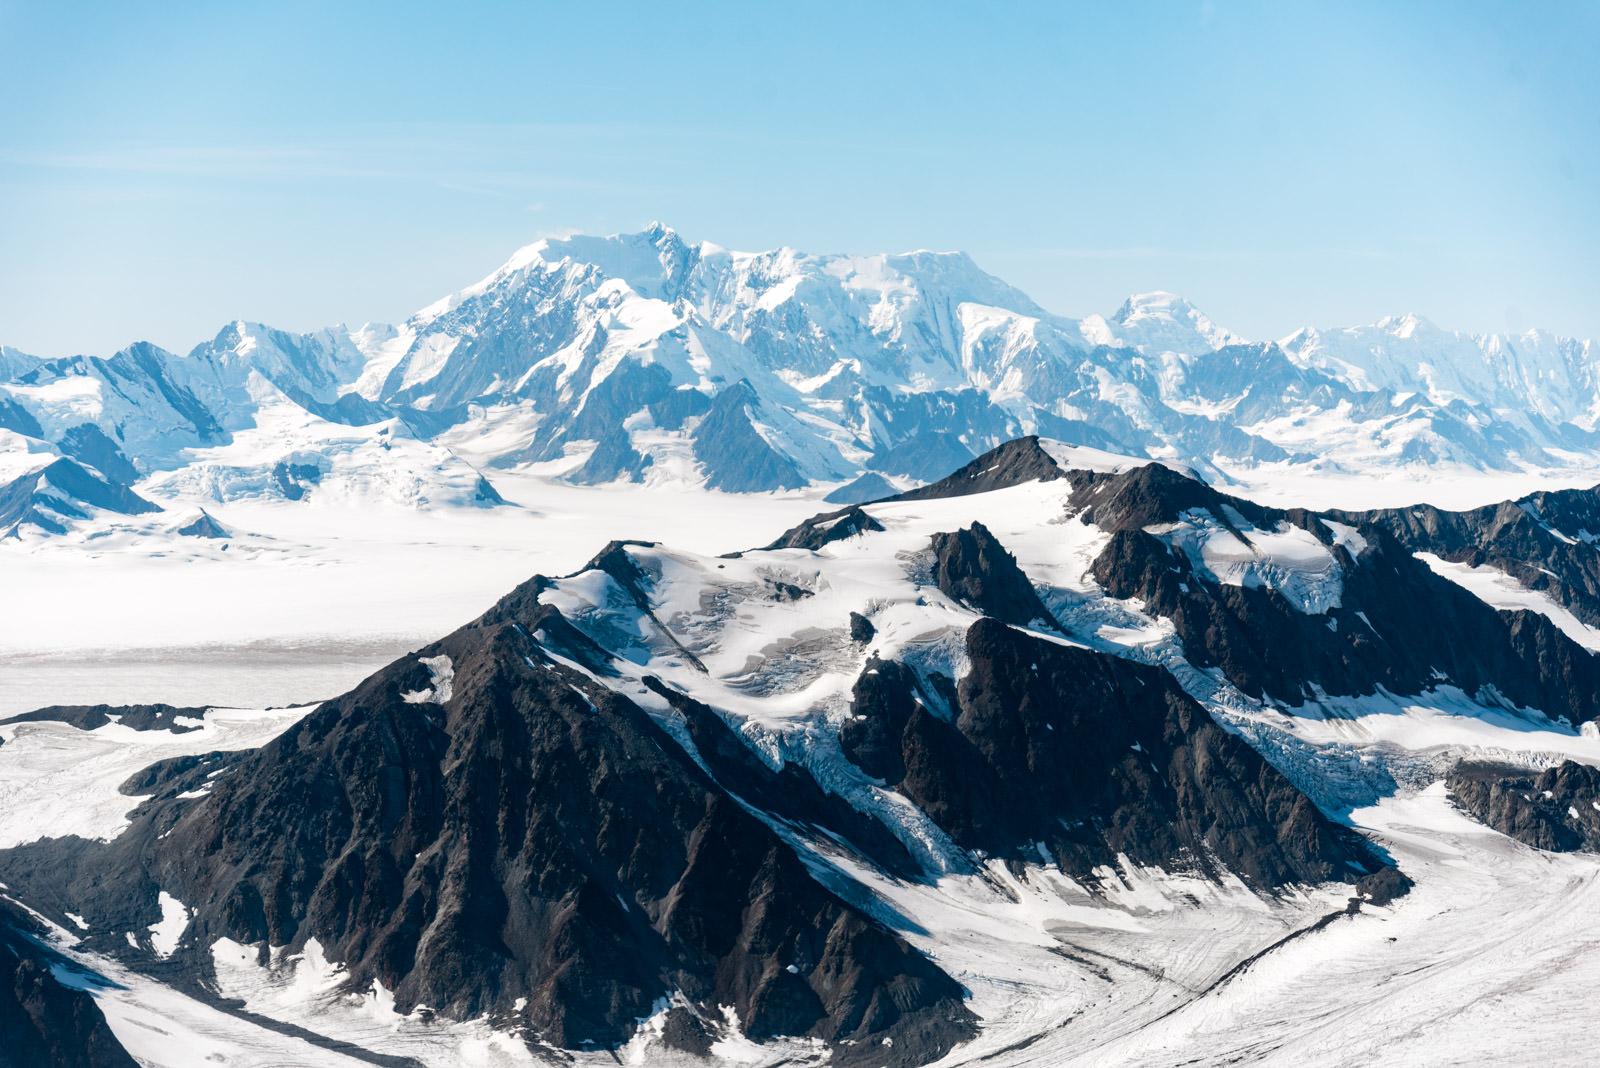 Bagley Icefield - University Range Tour: Mt Stellar